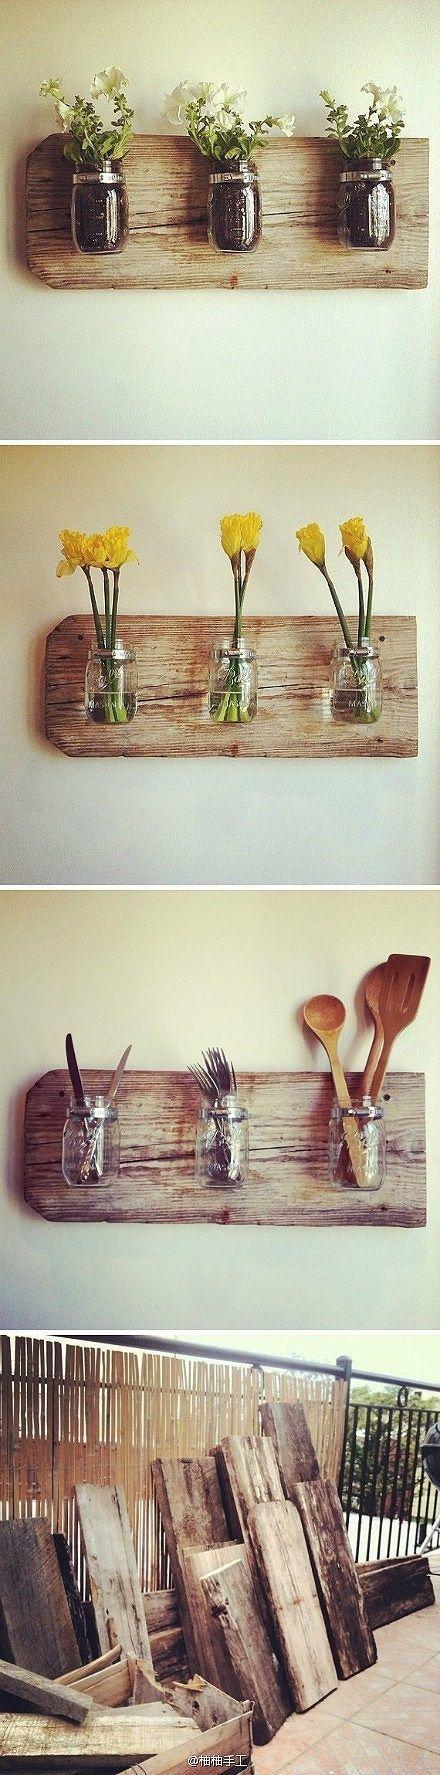 Trucs/DIY de rangement dans la cuisine.